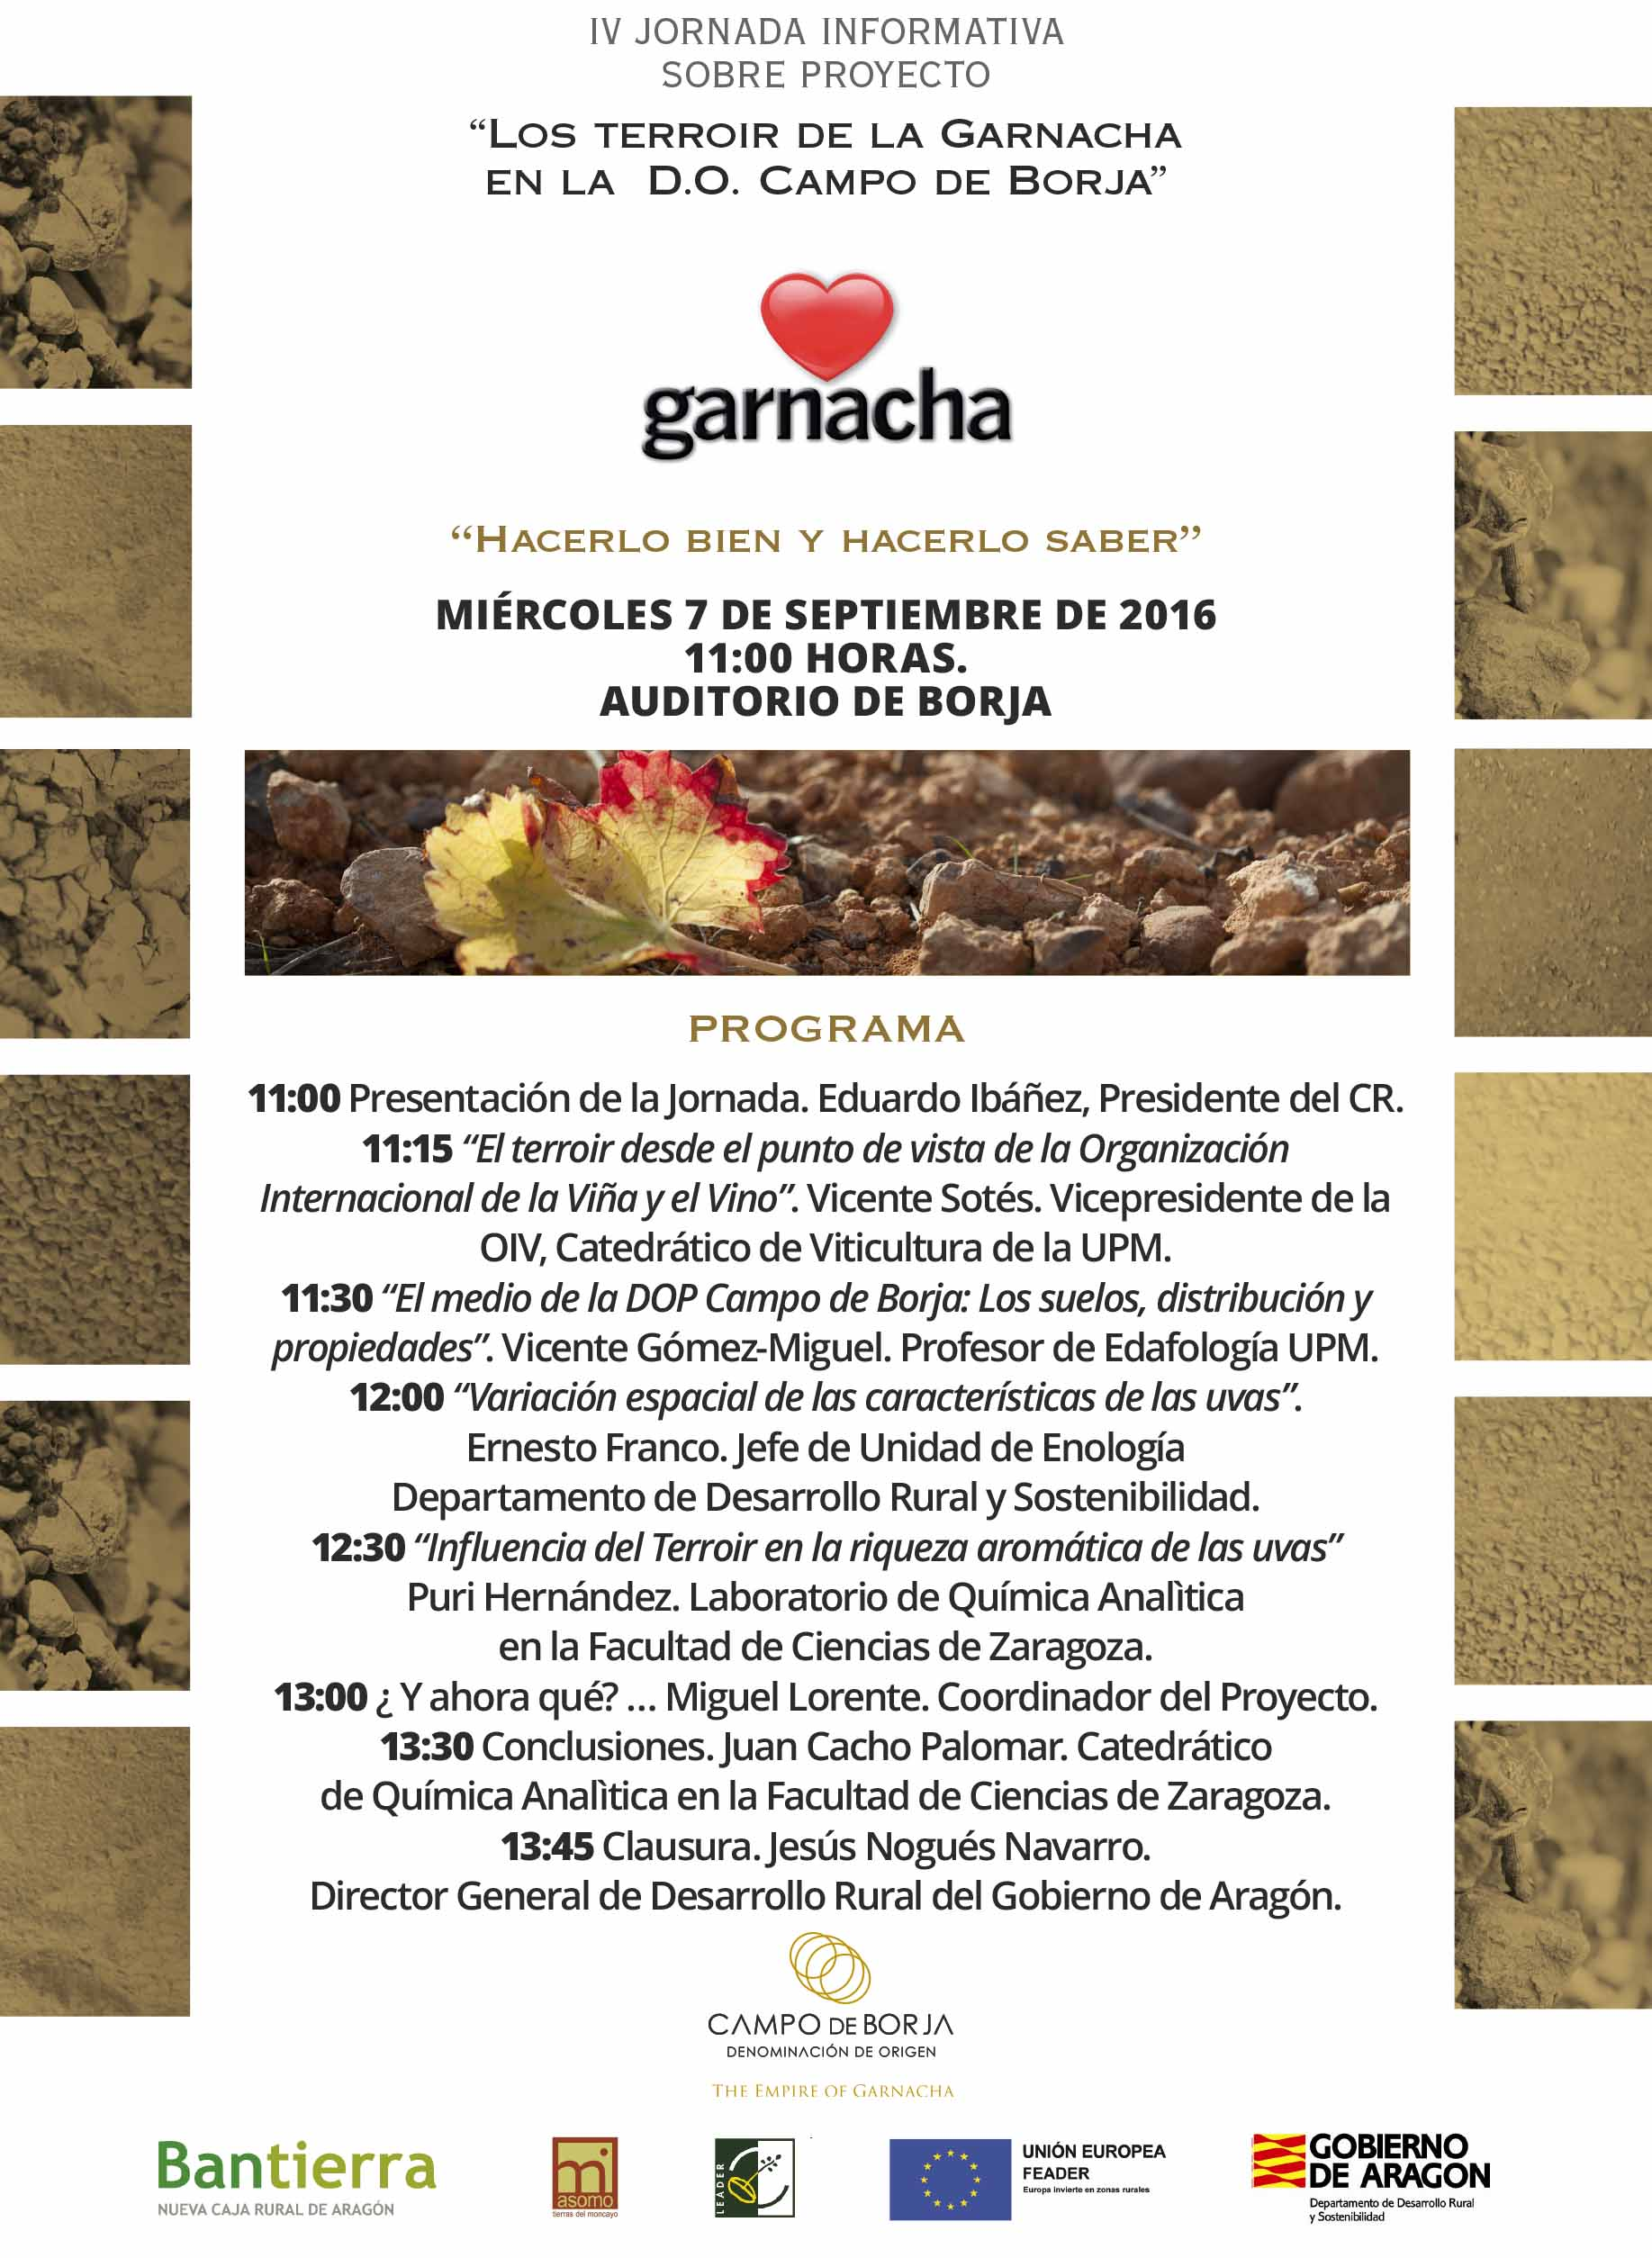 5barricas-1608-borja-cartel_IV_jornada_proyecto_terroir_2016